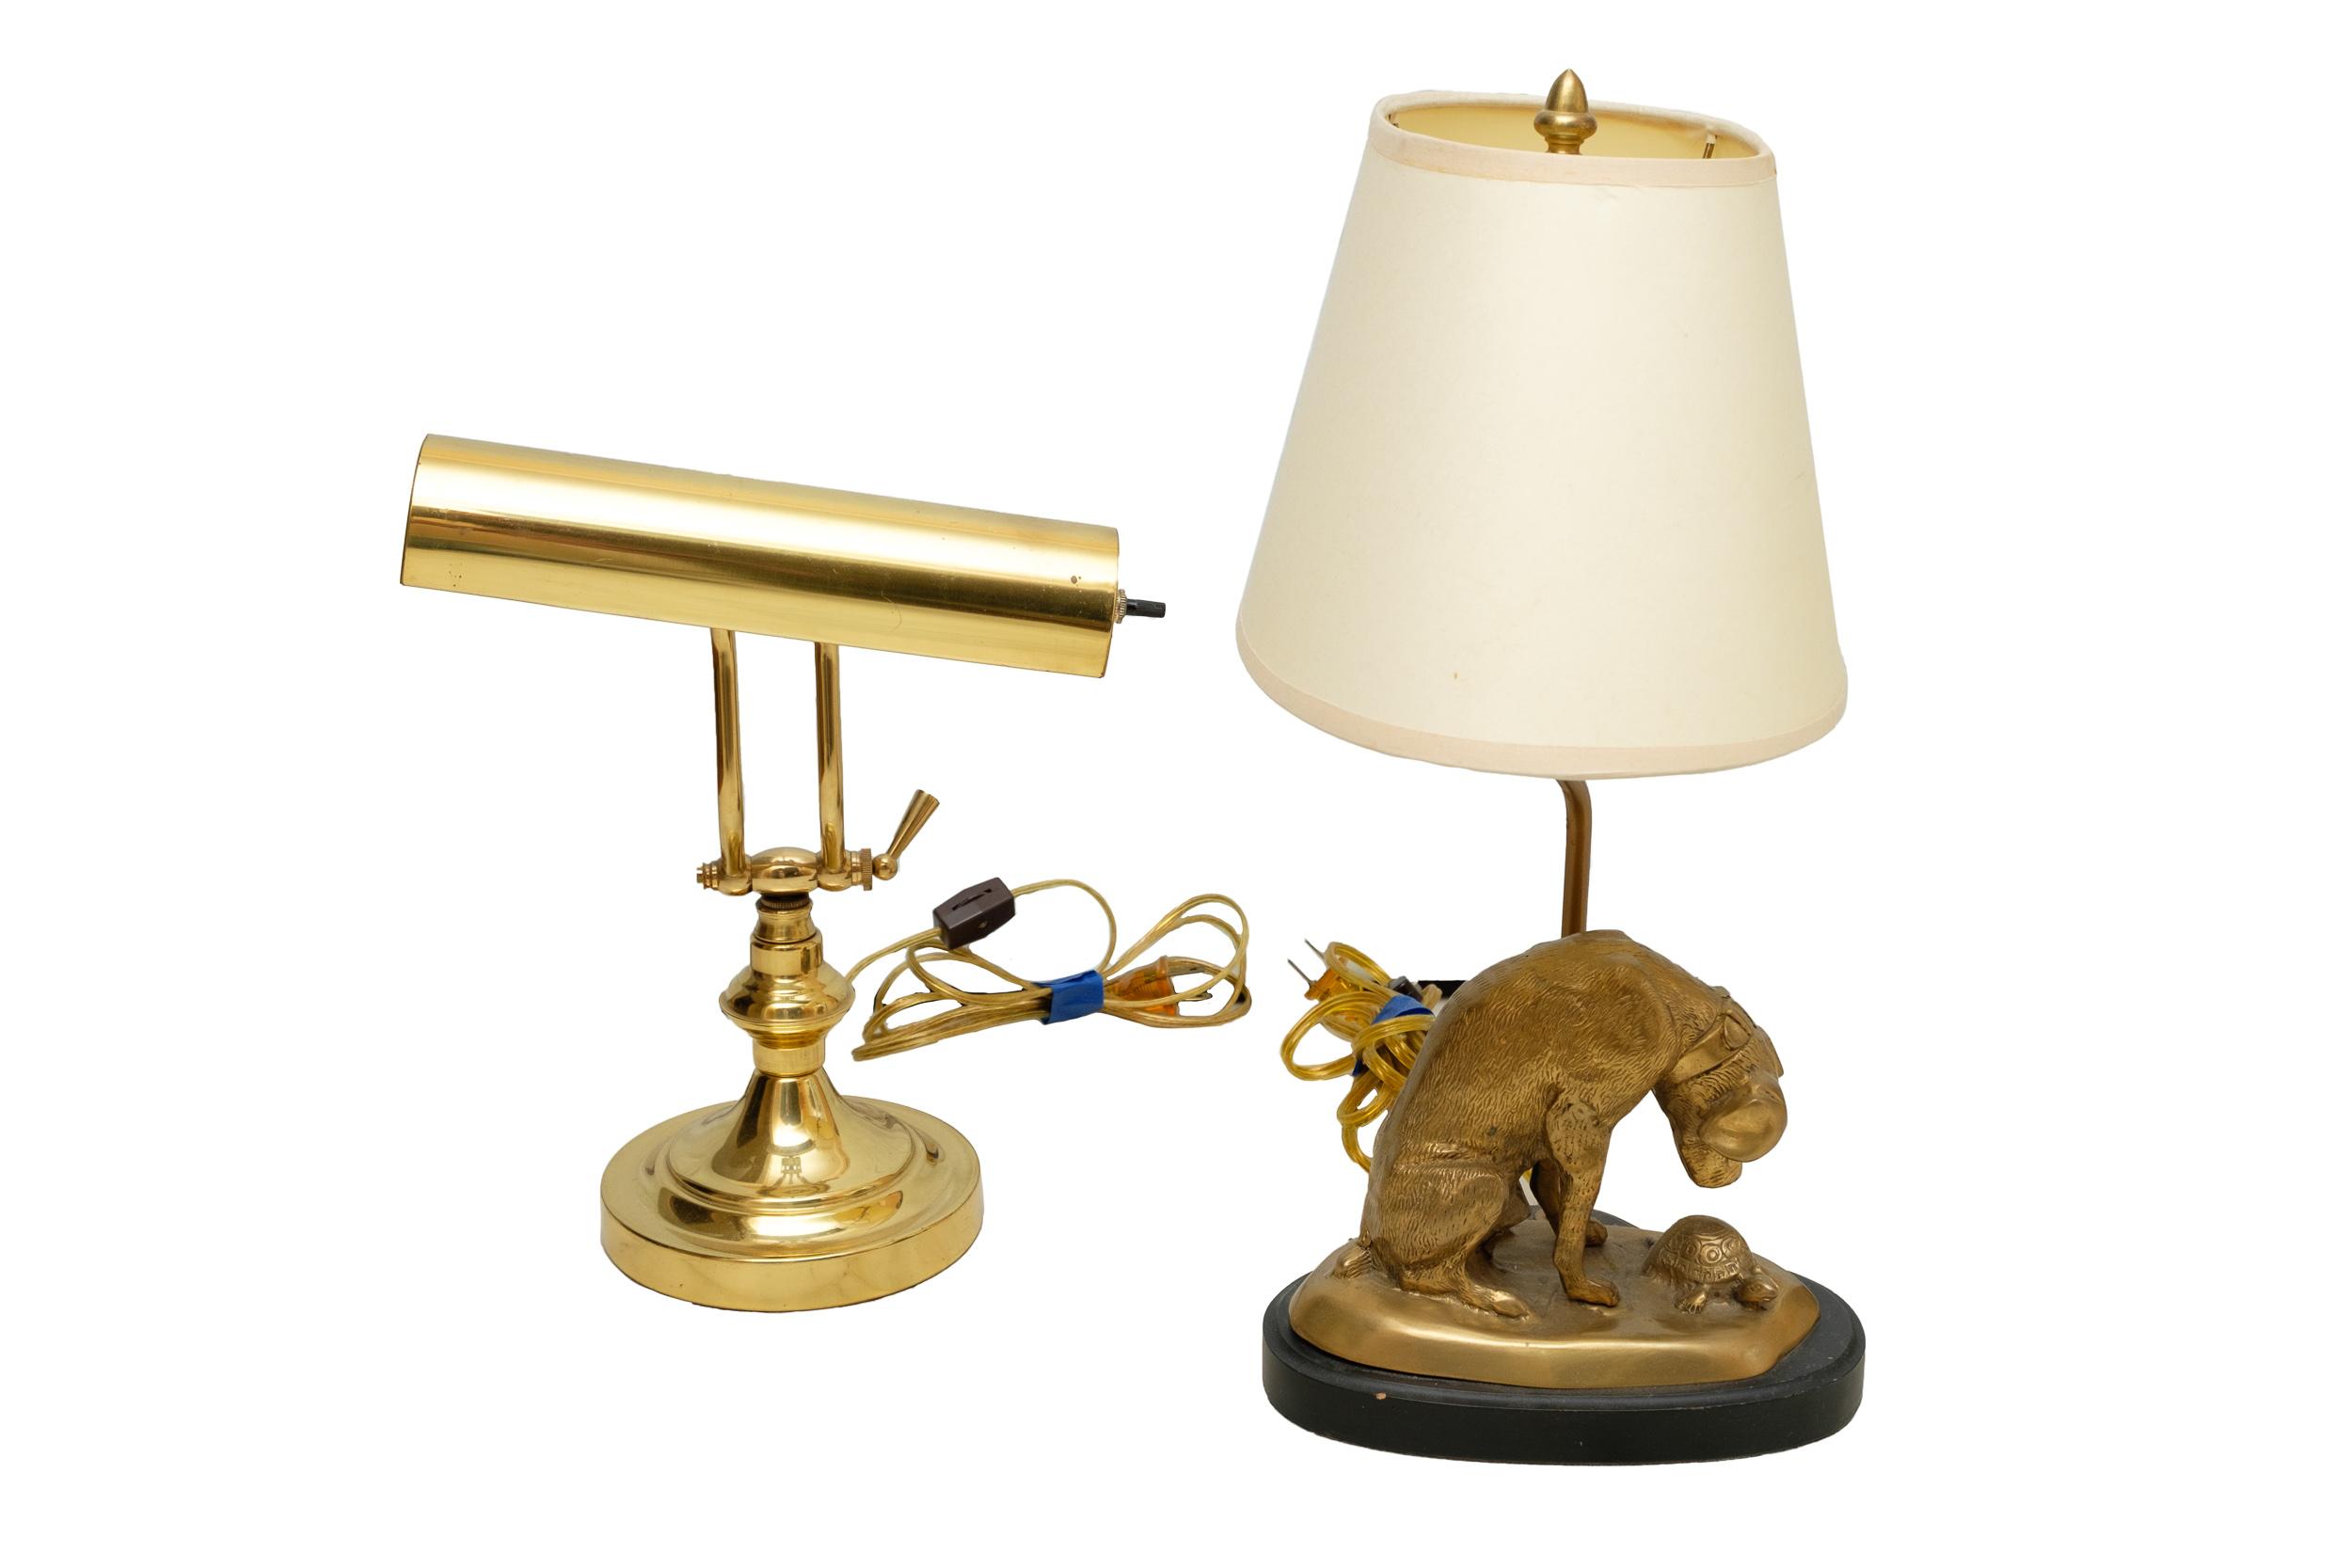 tortoise lighting. Vintage Brass Piano Lamp And Dog Tortoise Figural Lighting